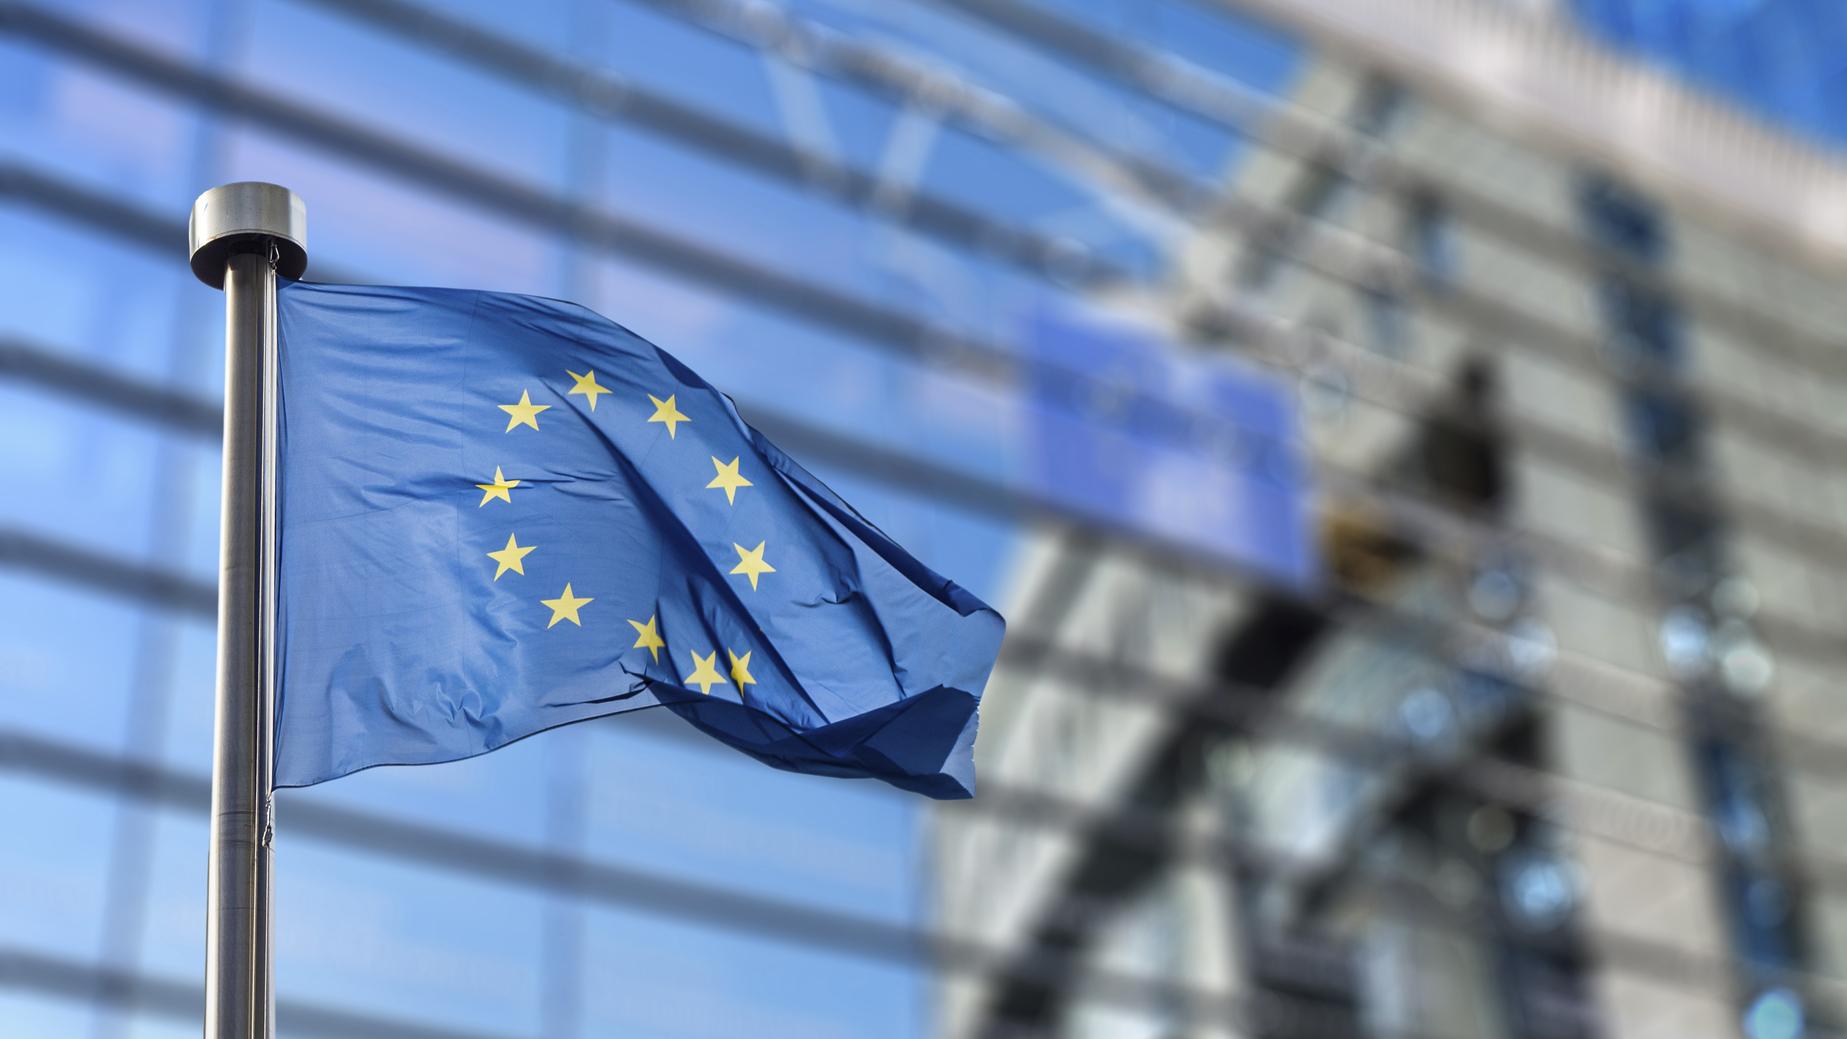 4.2. Vodič Evropske unije (EU) - slika 1